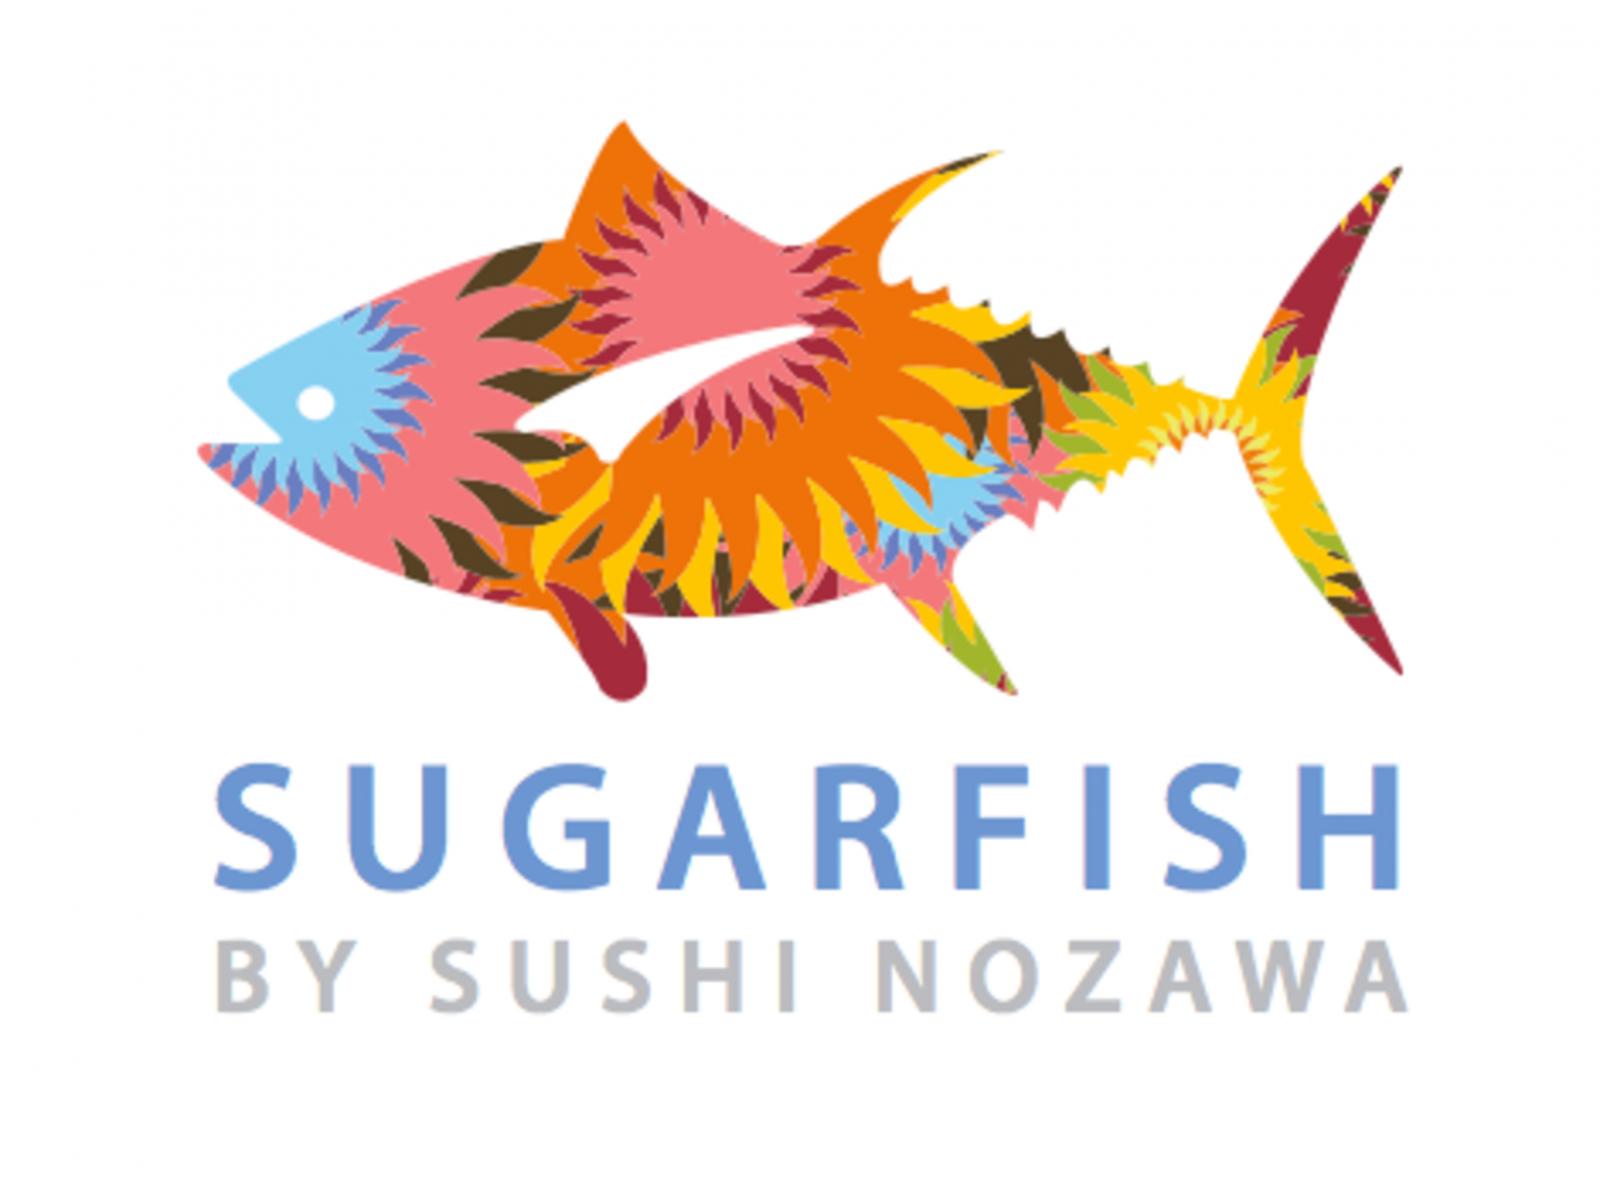 SUGARFISH by Sushi Nozawa | Downtown LA